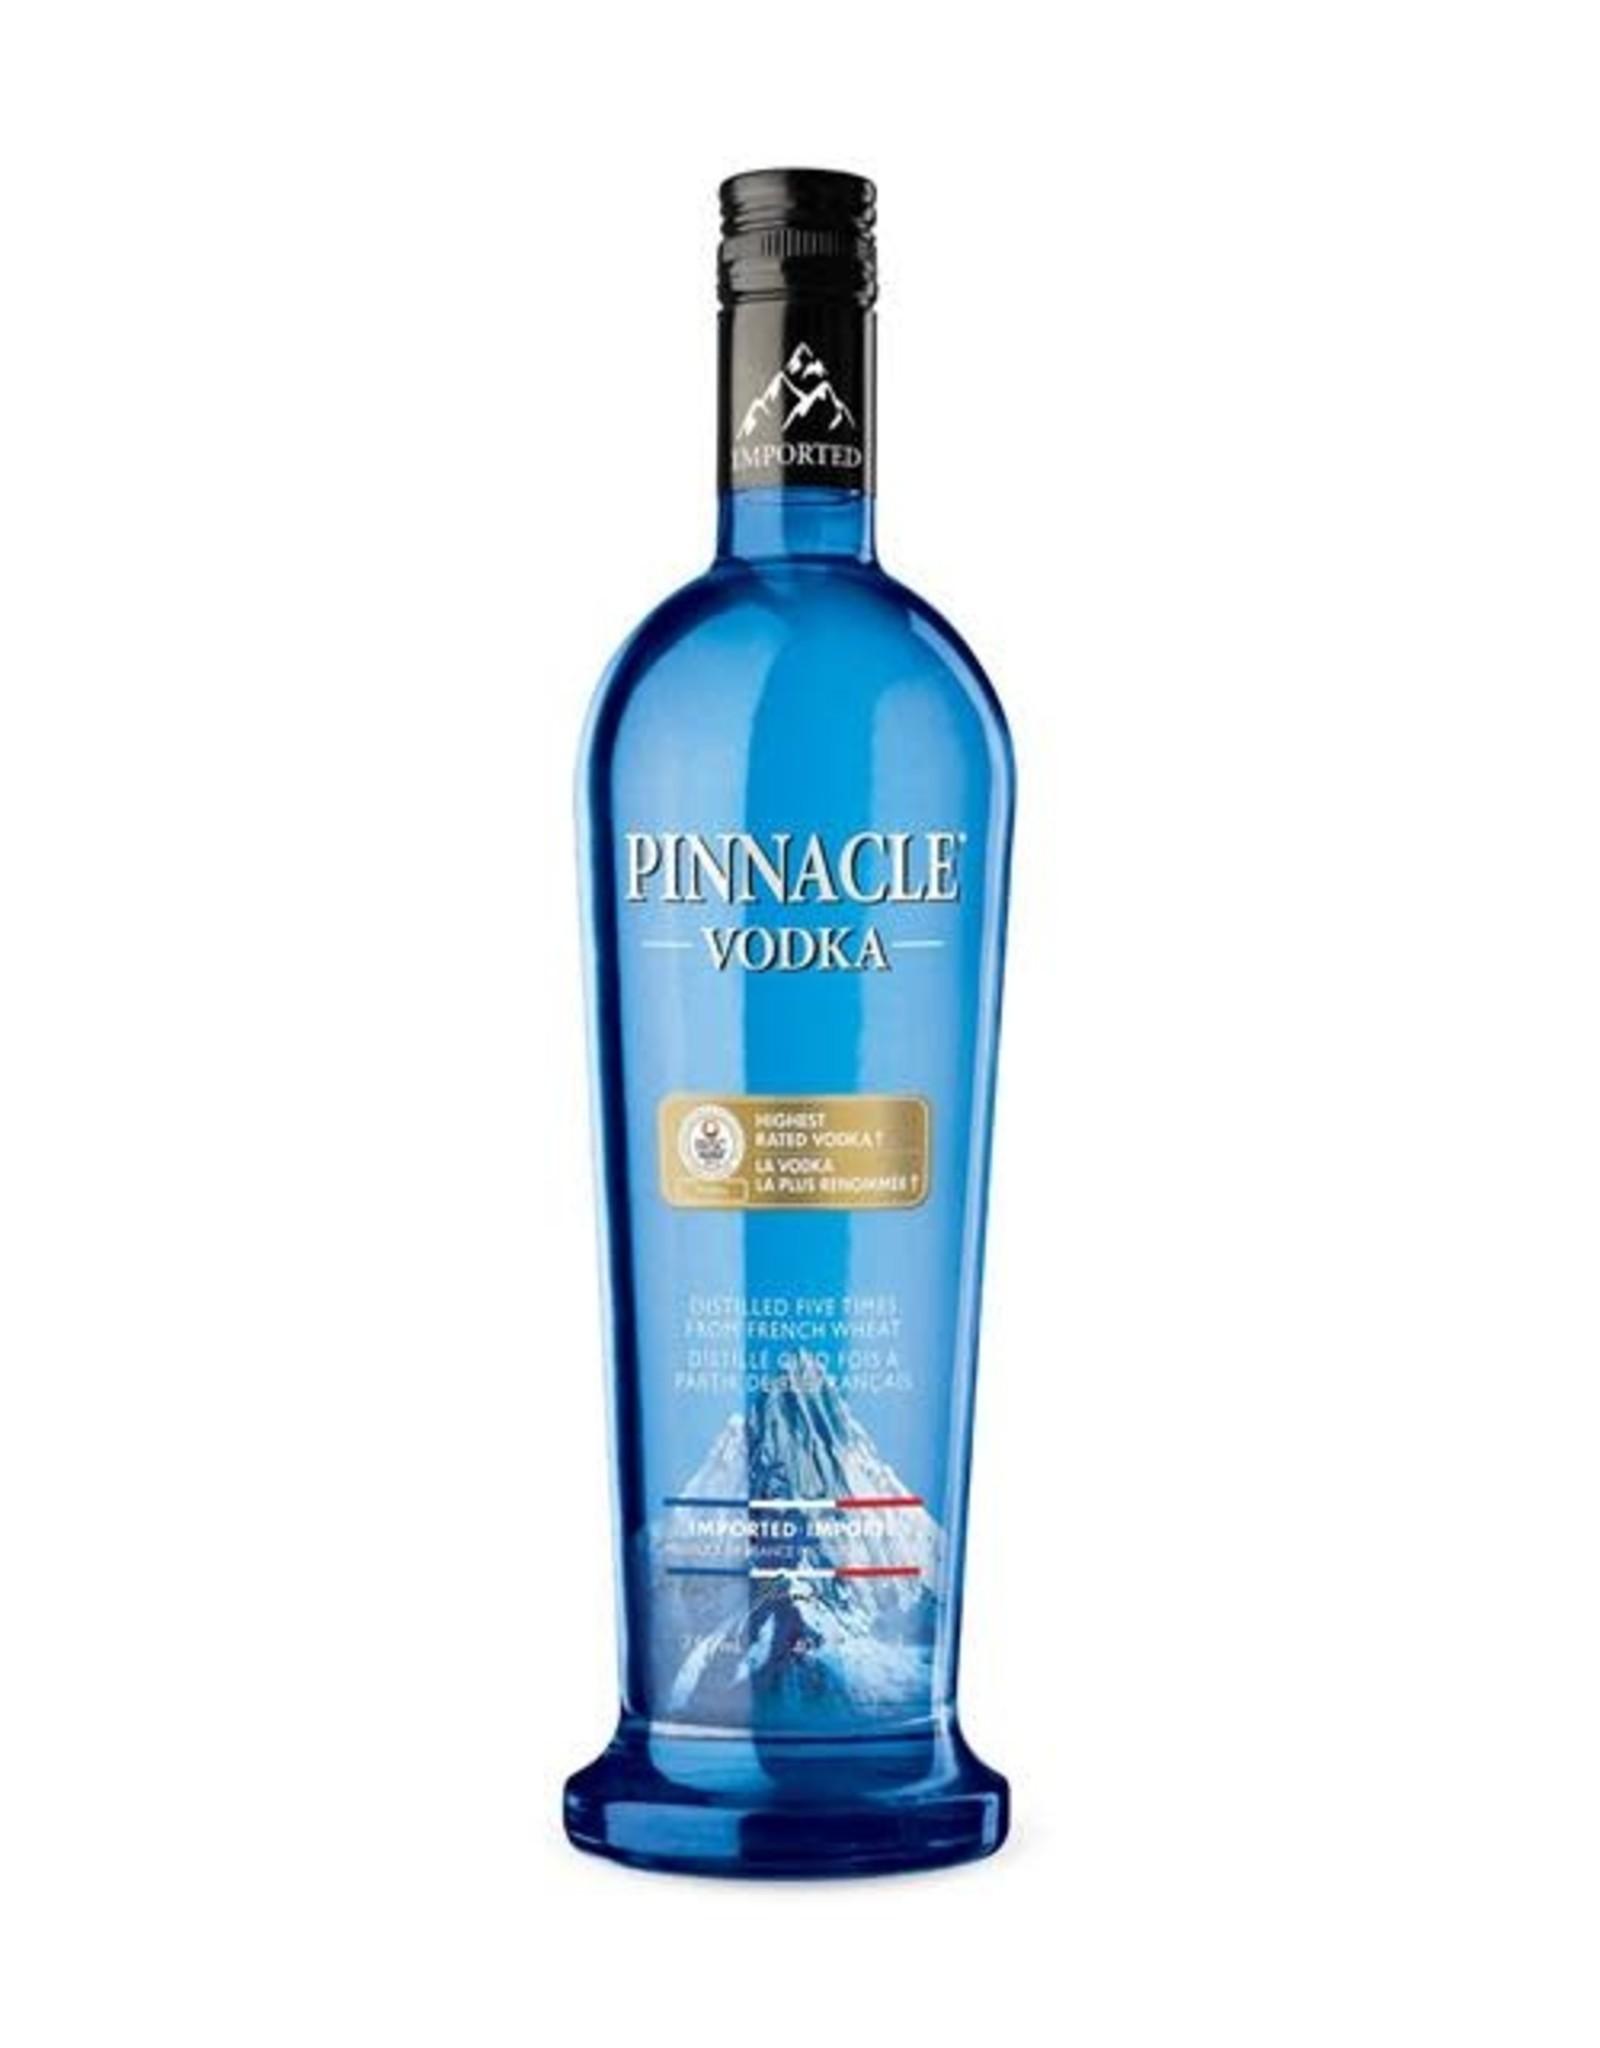 PINNACLE VODKA 750ML